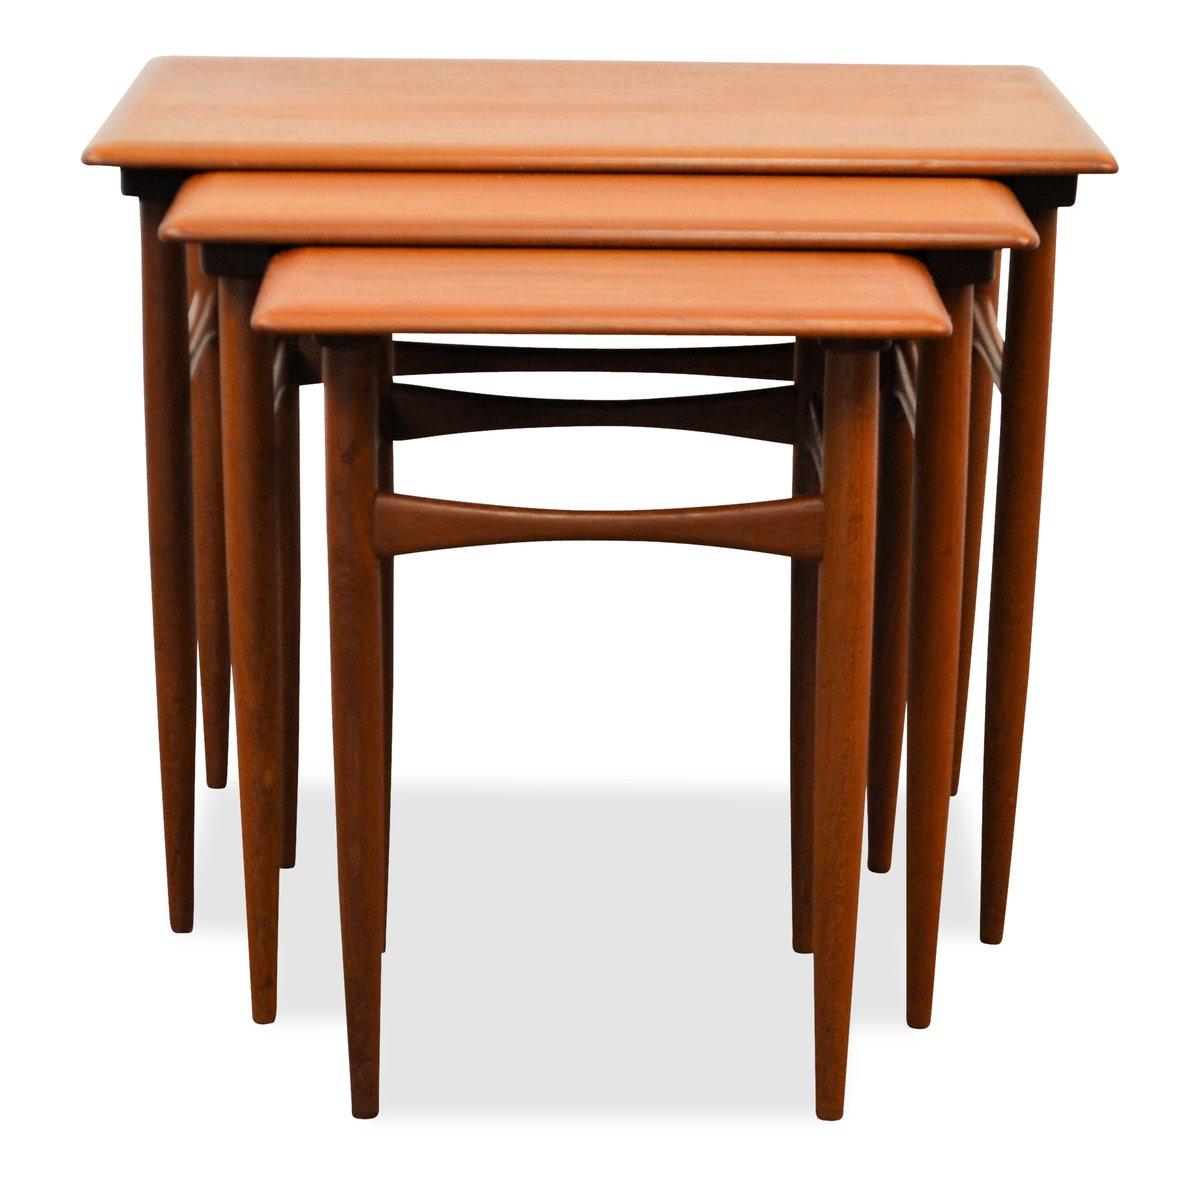 tables gigognes vintage par kai kristiansen pour skovmand andersen en vente sur pamono. Black Bedroom Furniture Sets. Home Design Ideas